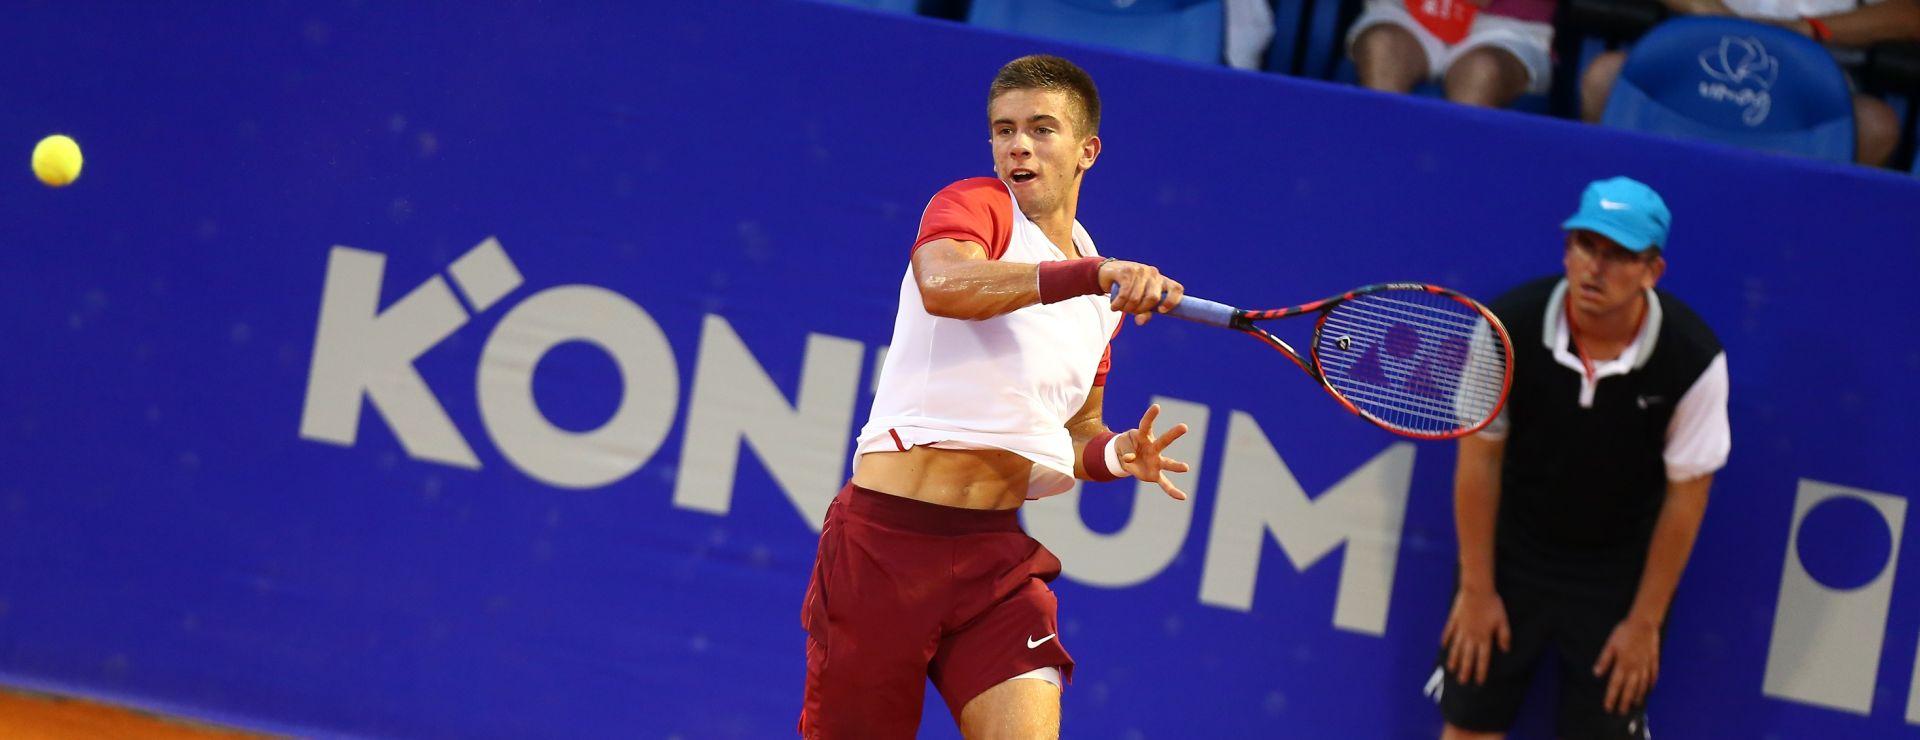 ATP Umag: Ćorić poražen u četvrtfinalu